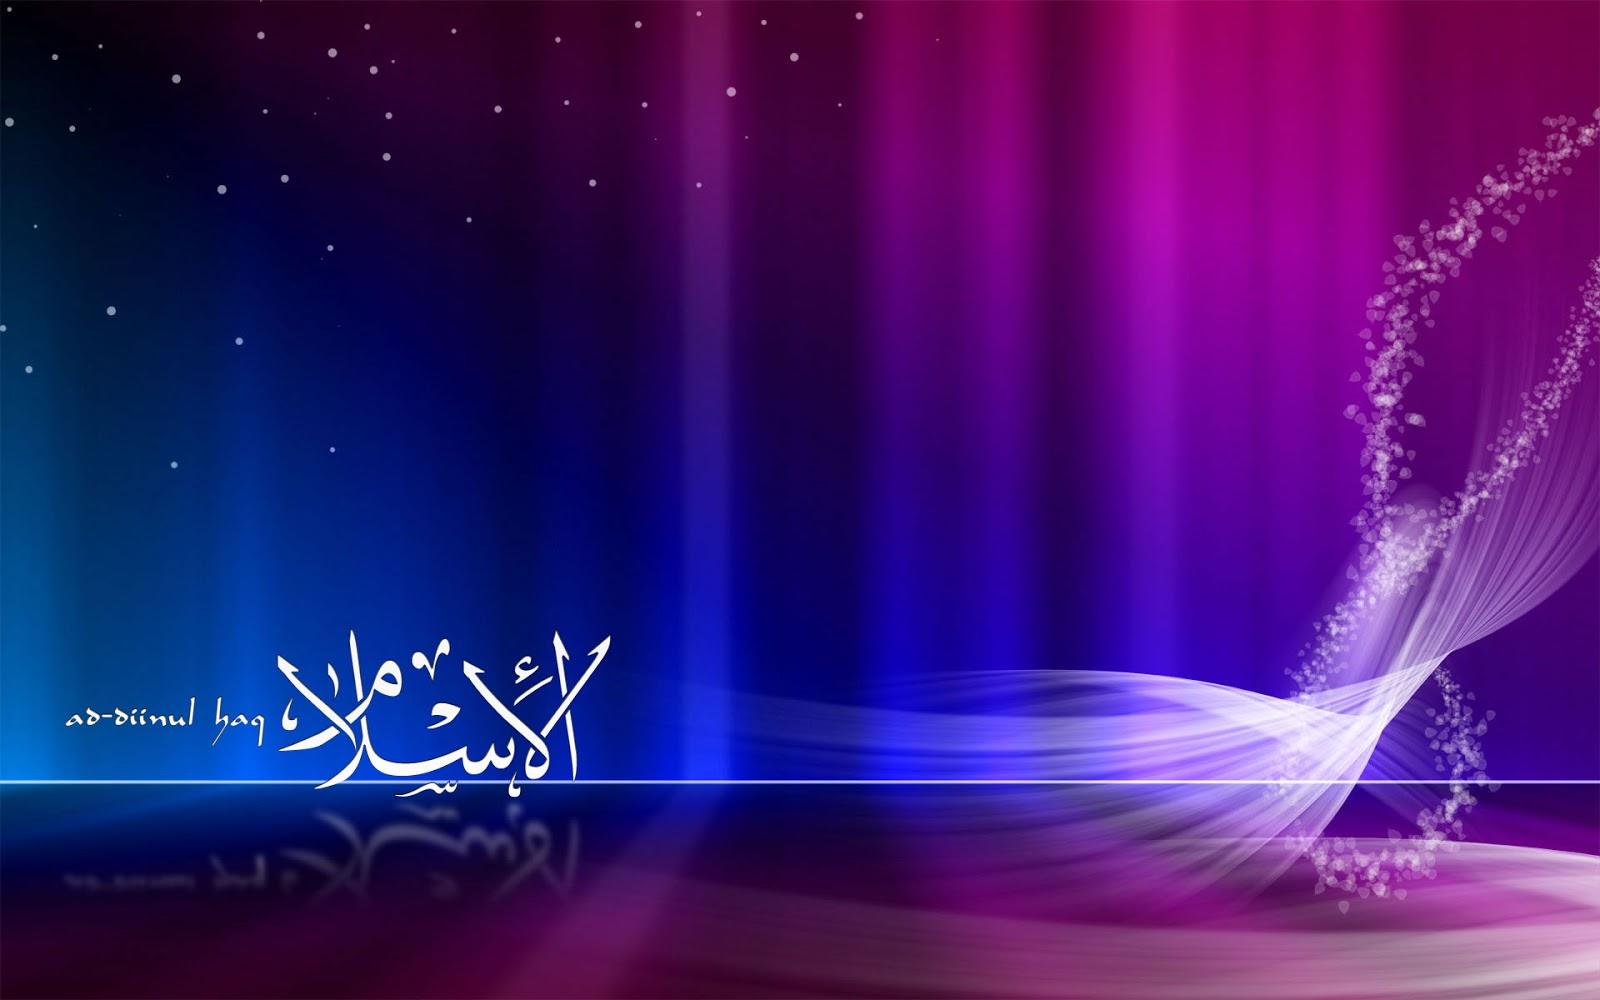 http://3.bp.blogspot.com/-pobl4oHbmRY/UNkywiL8pXI/AAAAAAAANBw/vPhSzfsXUyI/s1600/Islamic_Wallpaper_03_by_wheeqo.jpg